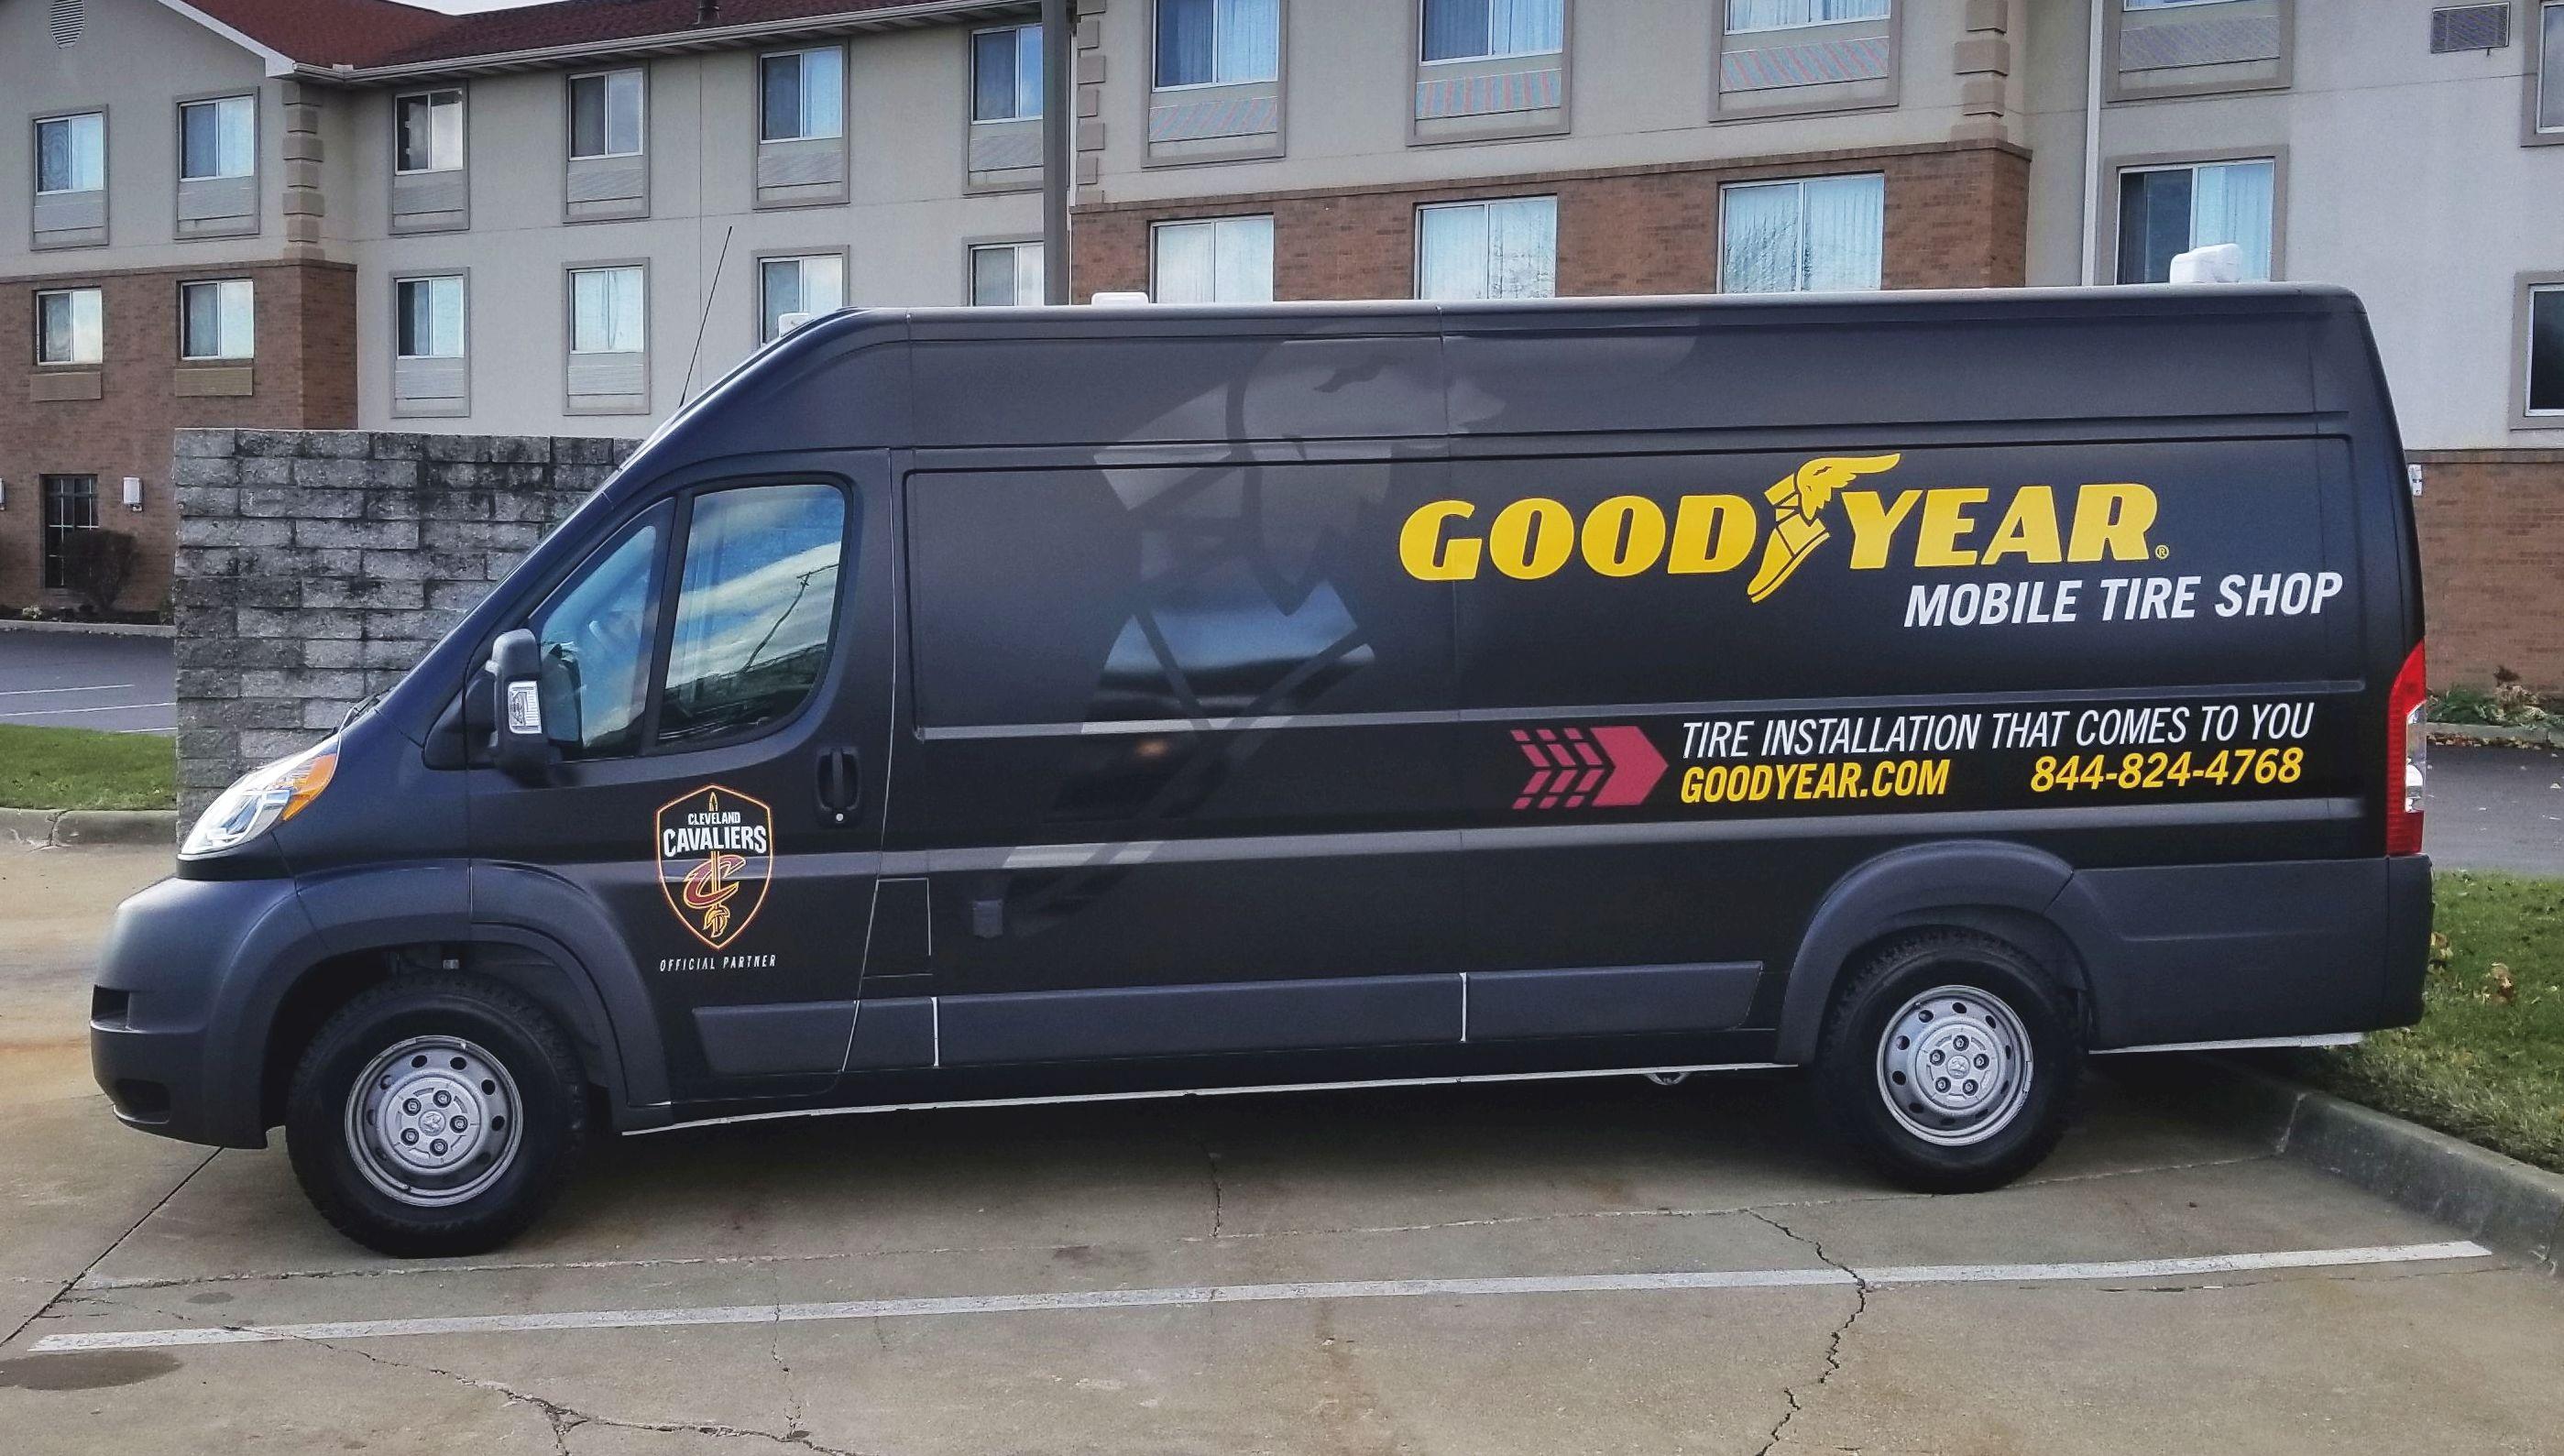 Goodyear Tests a Mobile Tire Shop Program